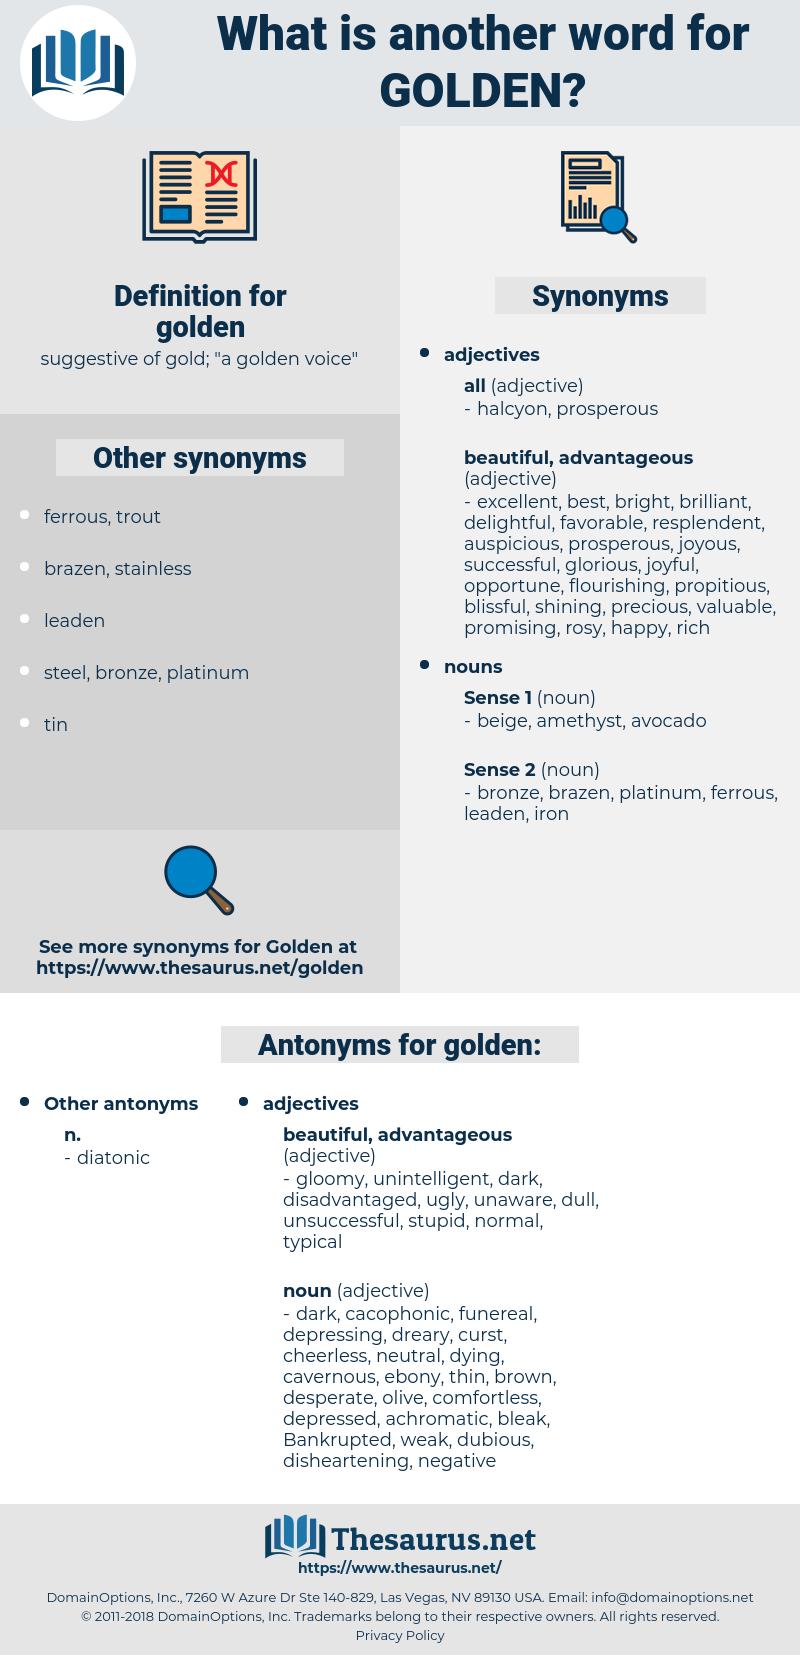 golden, synonym golden, another word for golden, words like golden, thesaurus golden